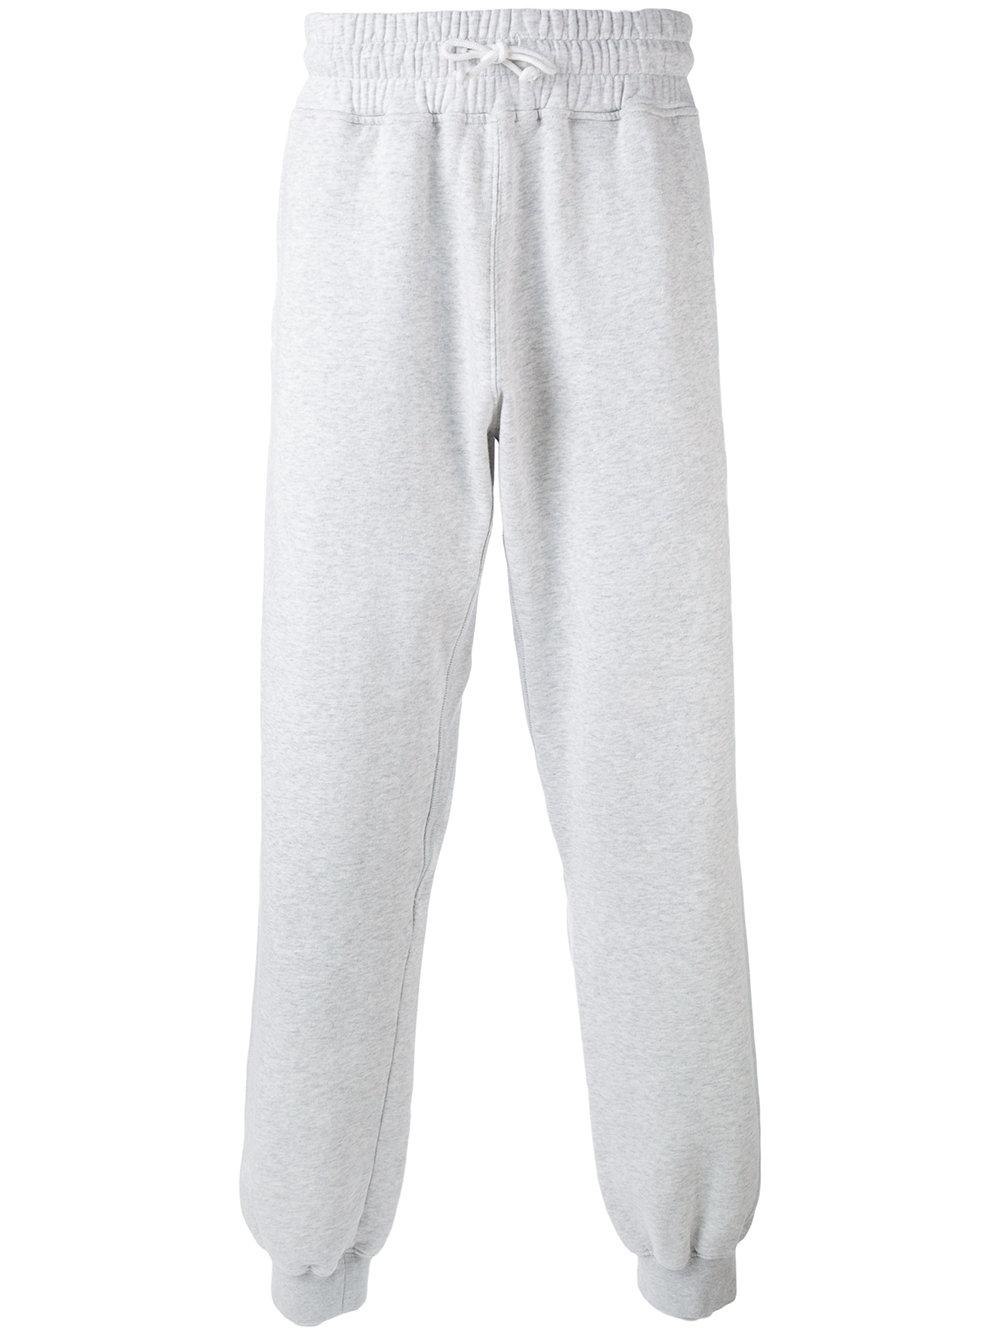 088a14289 Yeezy Tapered Sweatpants - Farfetch